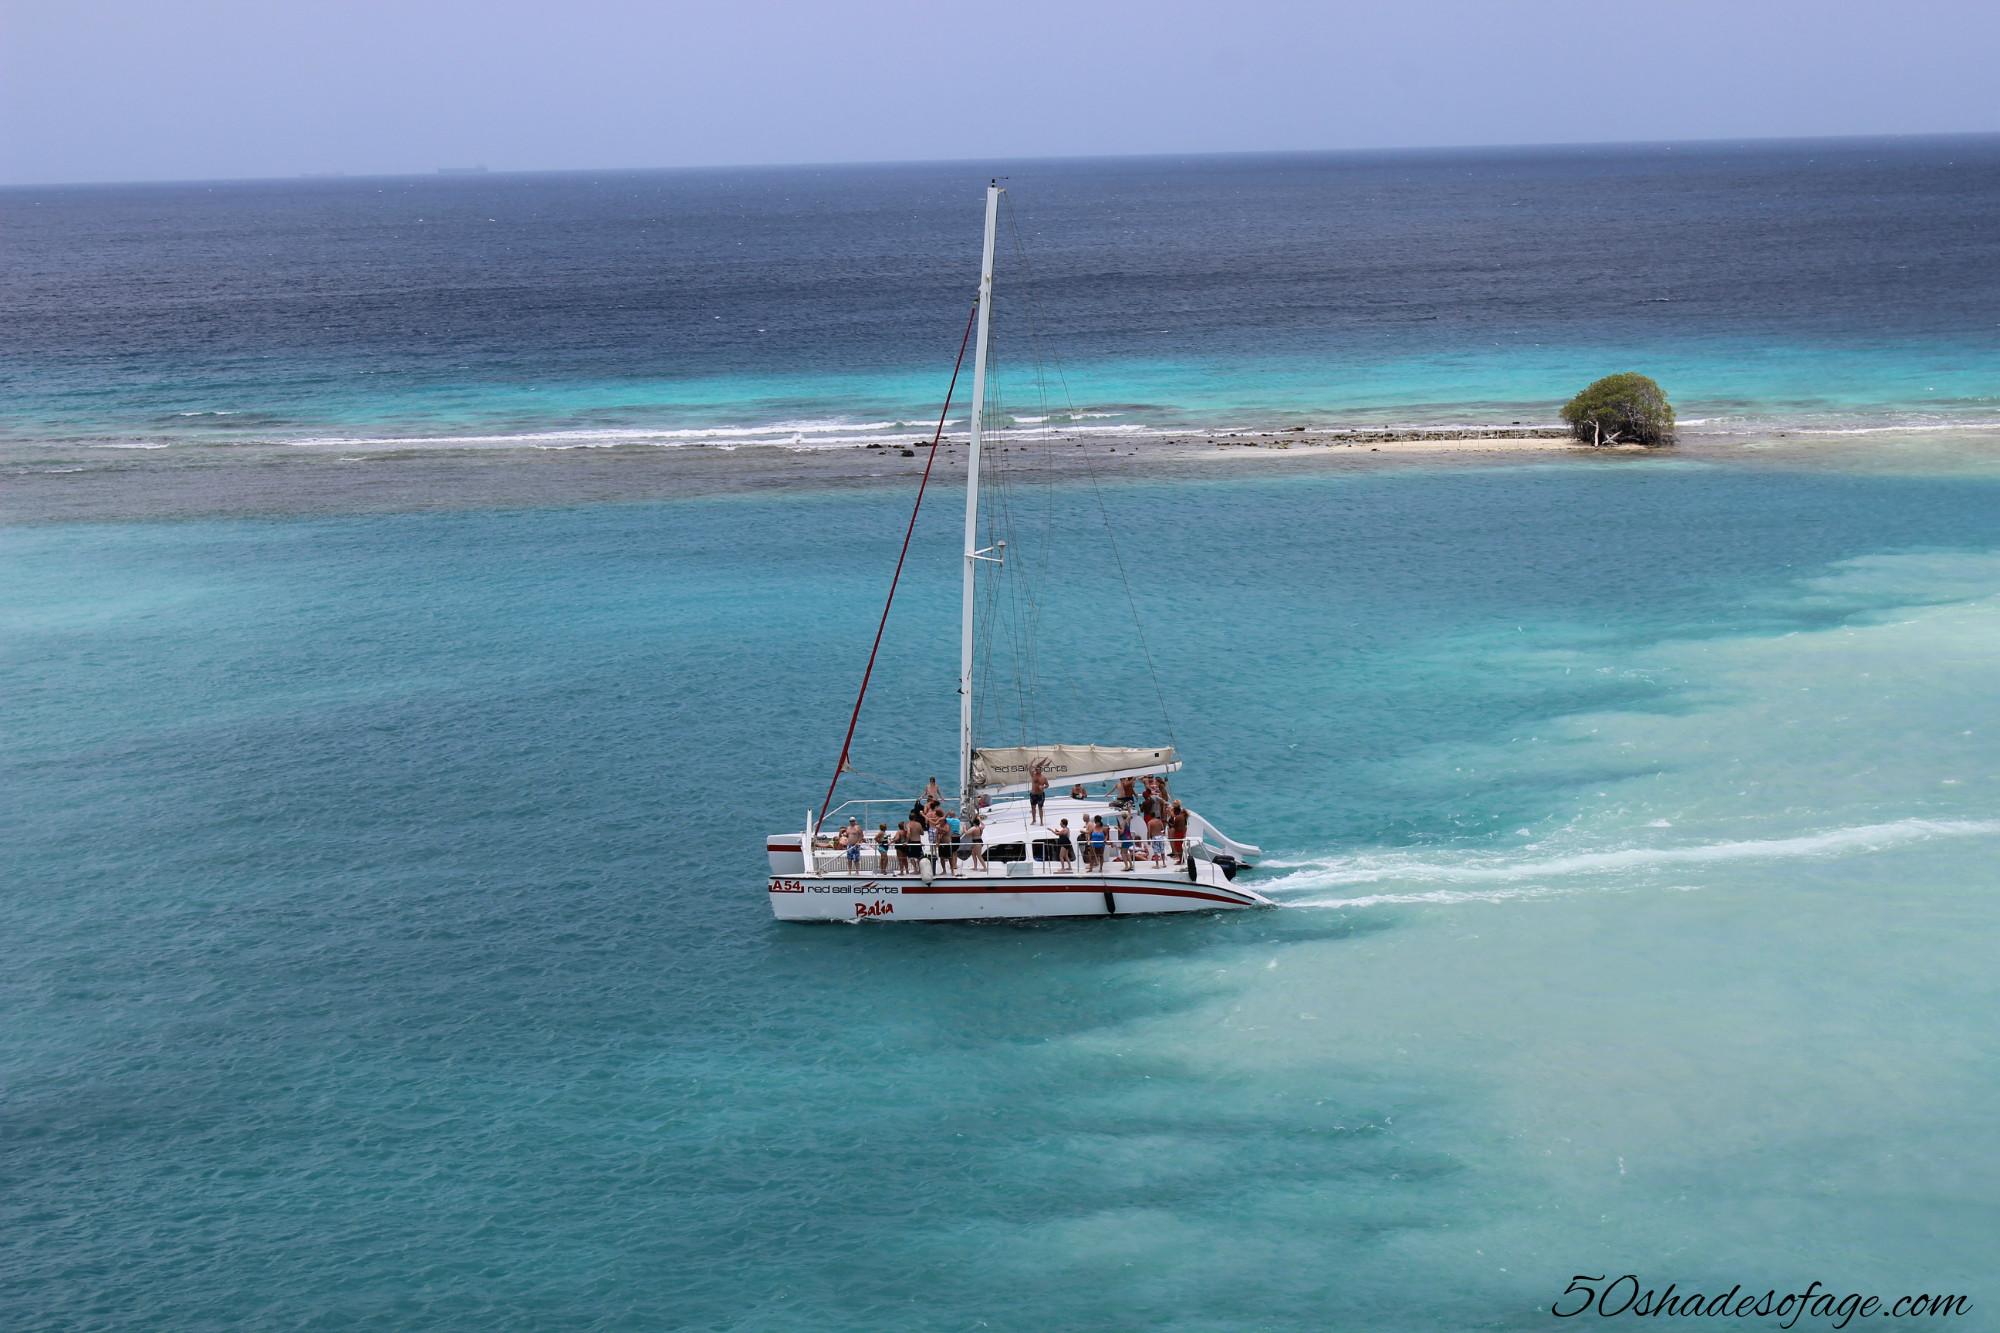 Aruba: ¡Arriba! ¡Arriba!